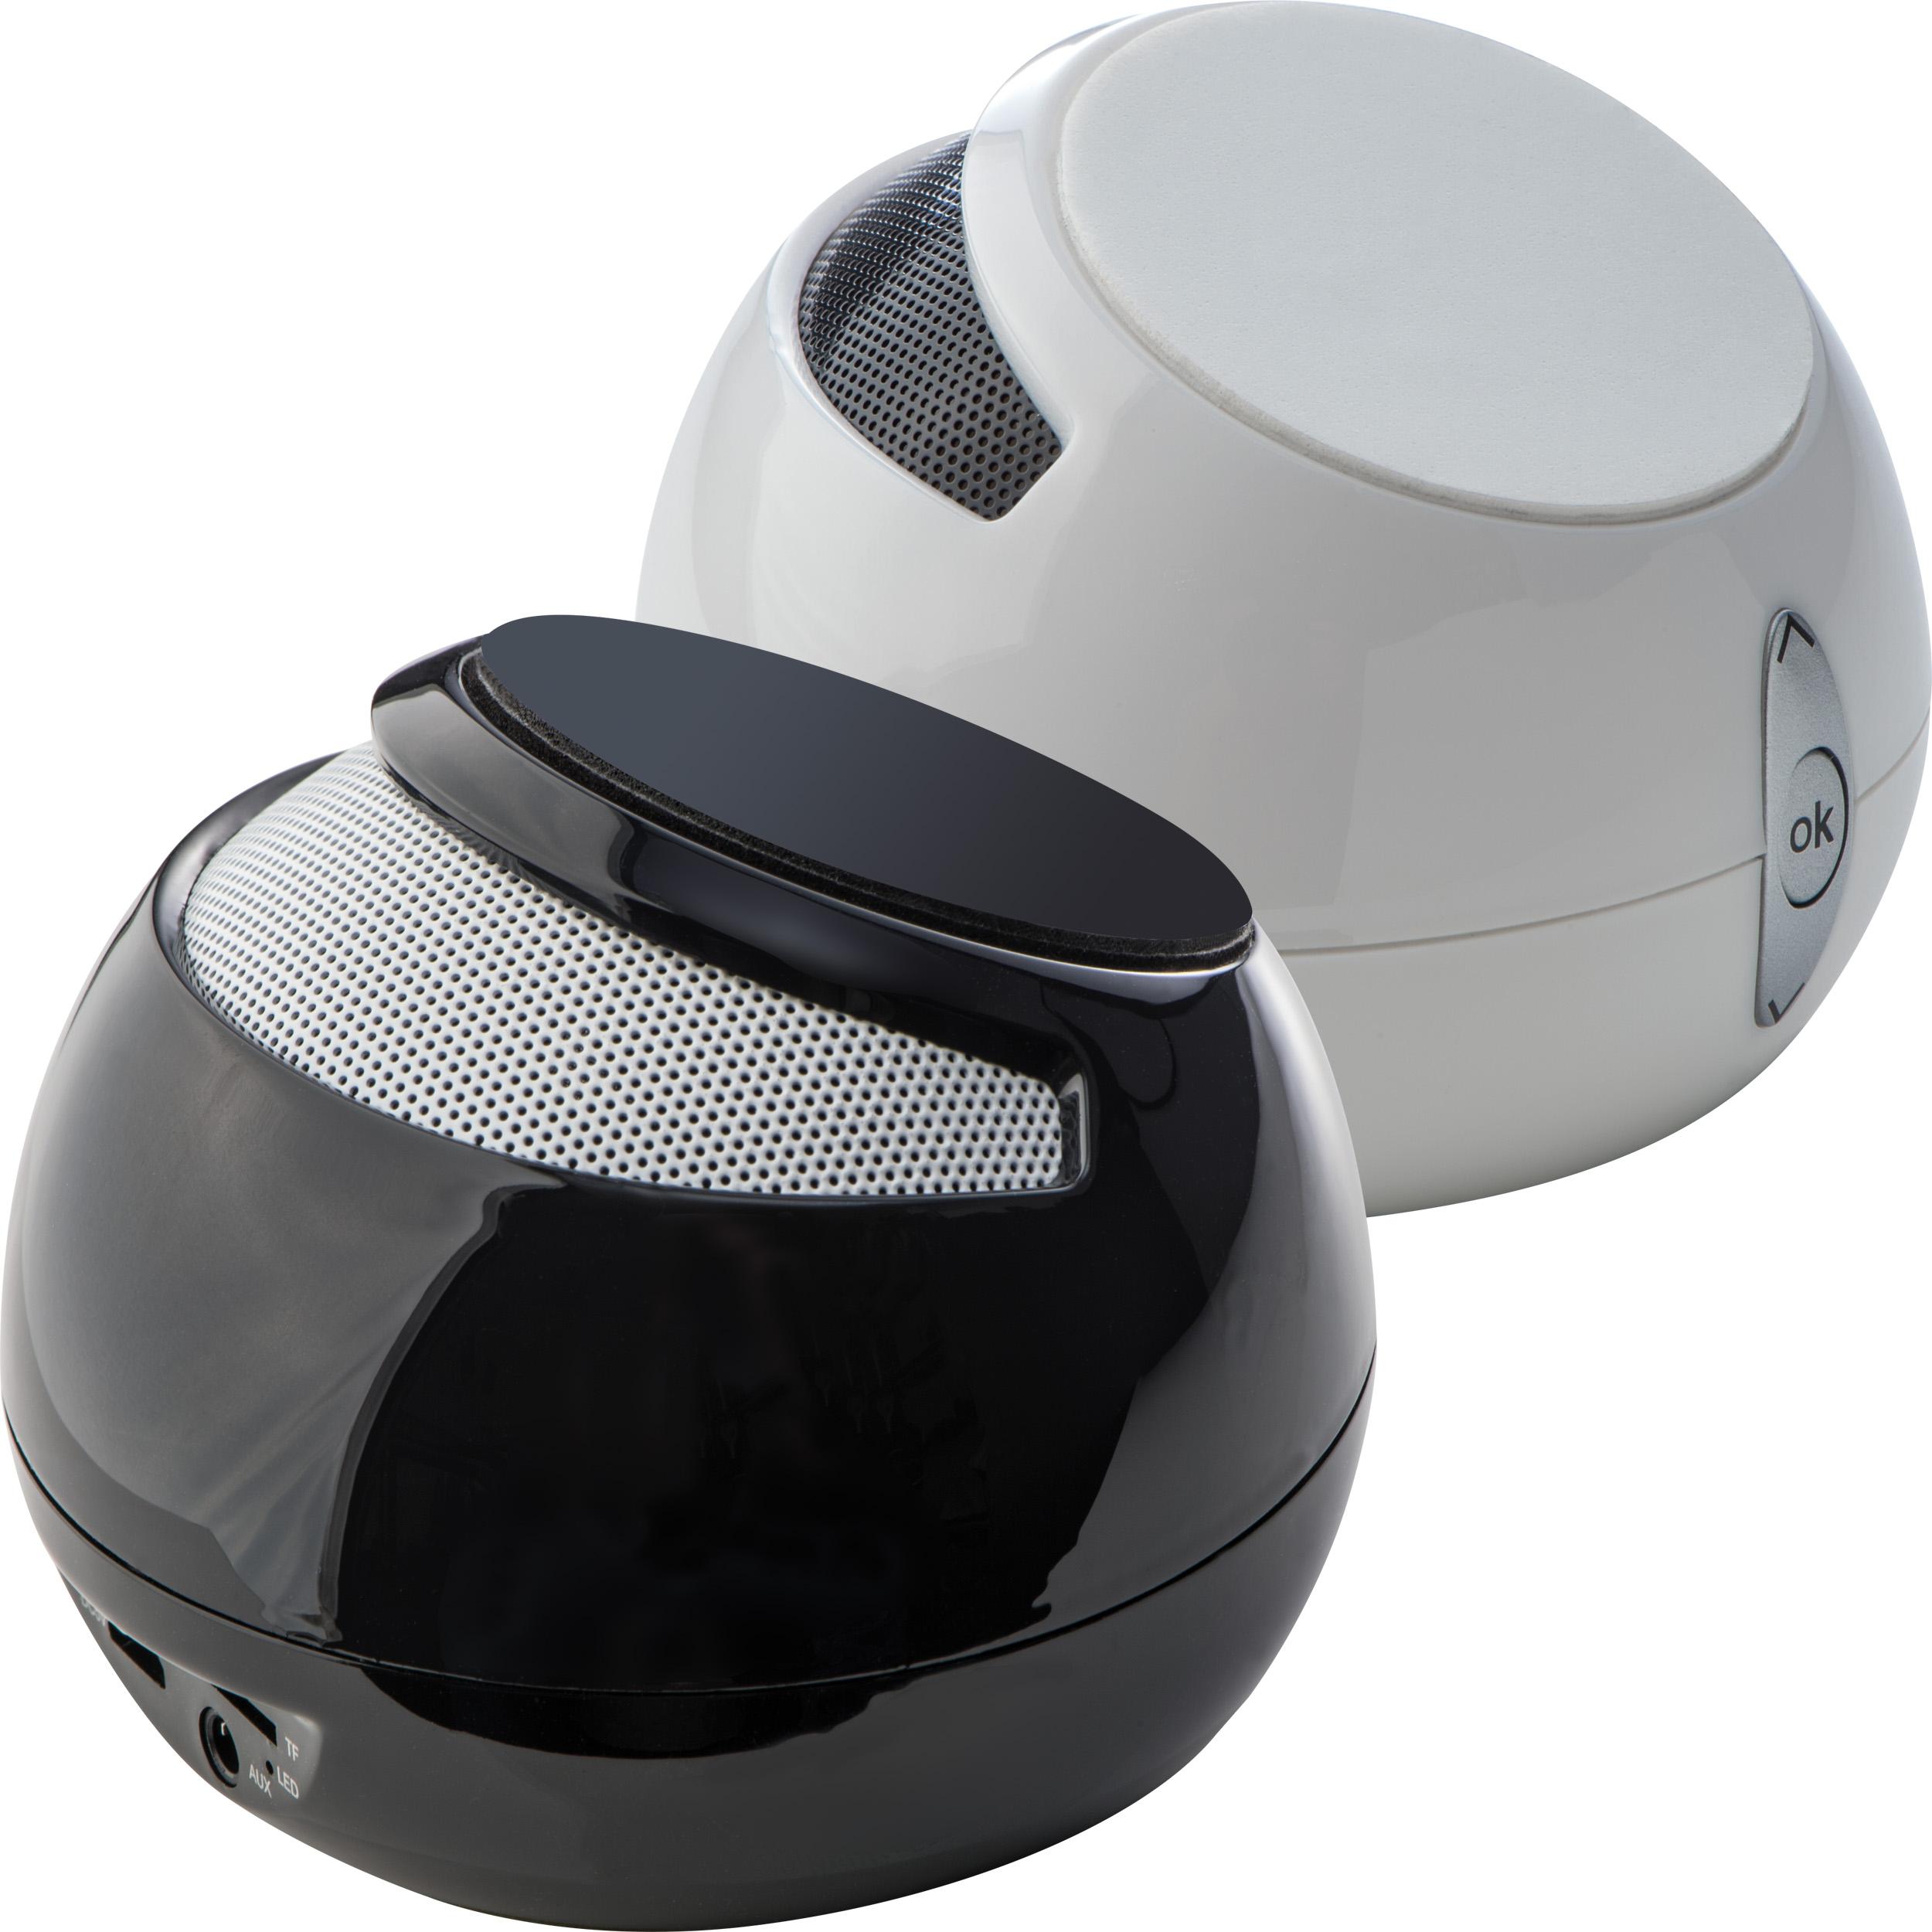 Bluetooth speaker with bracket